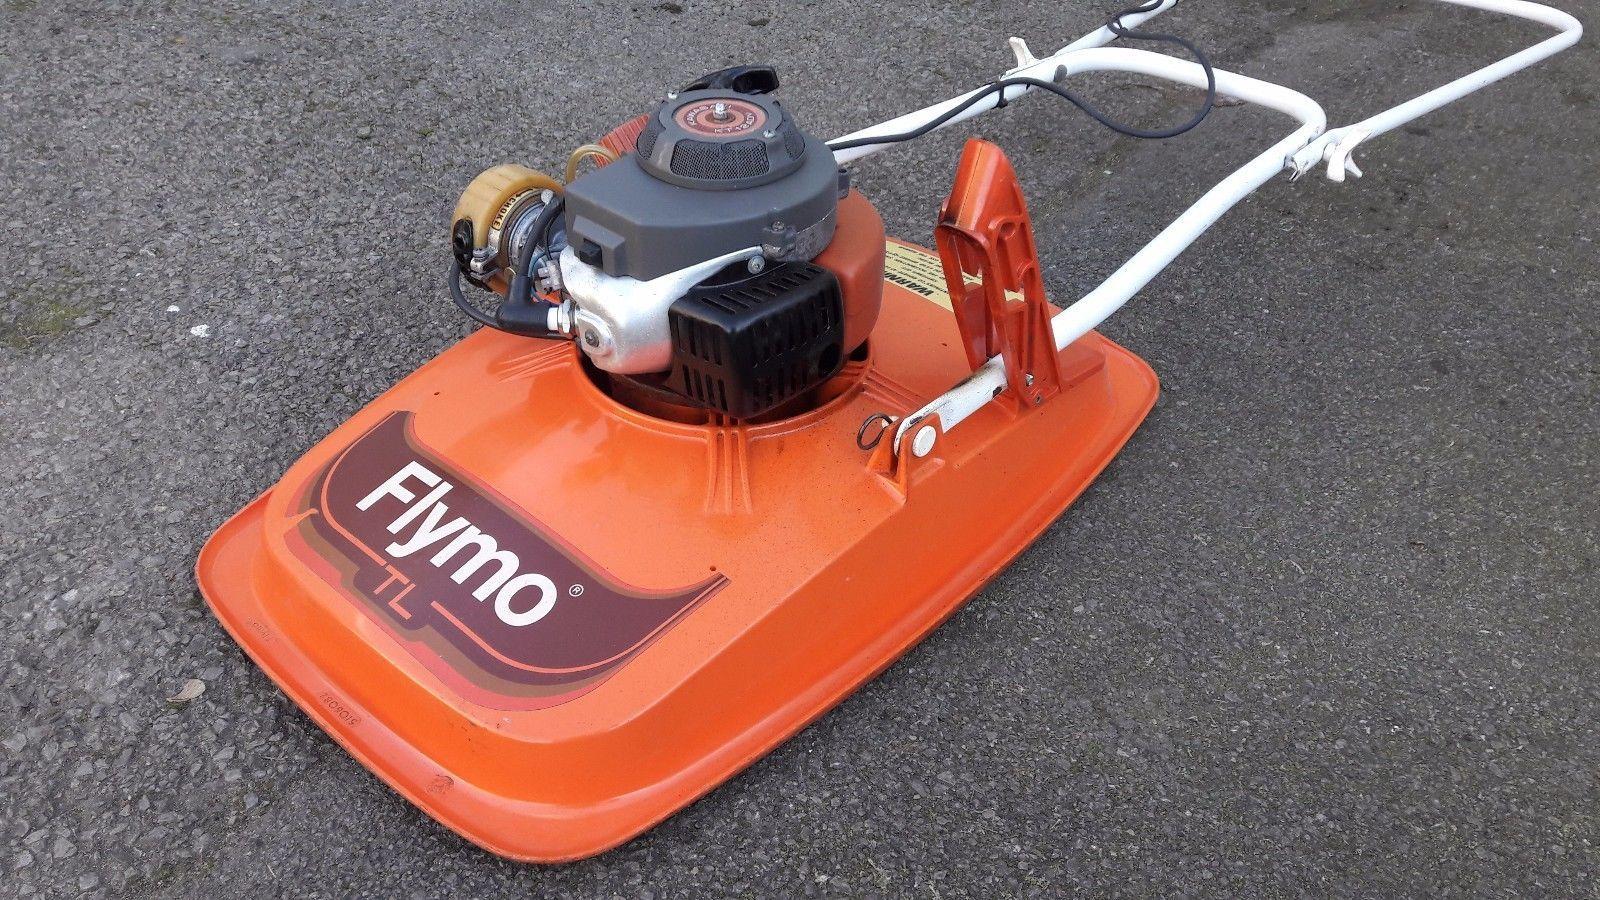 Petrol Flymo 2 Stroke Tl12 Kawasaki Engine 12 Steel Blade